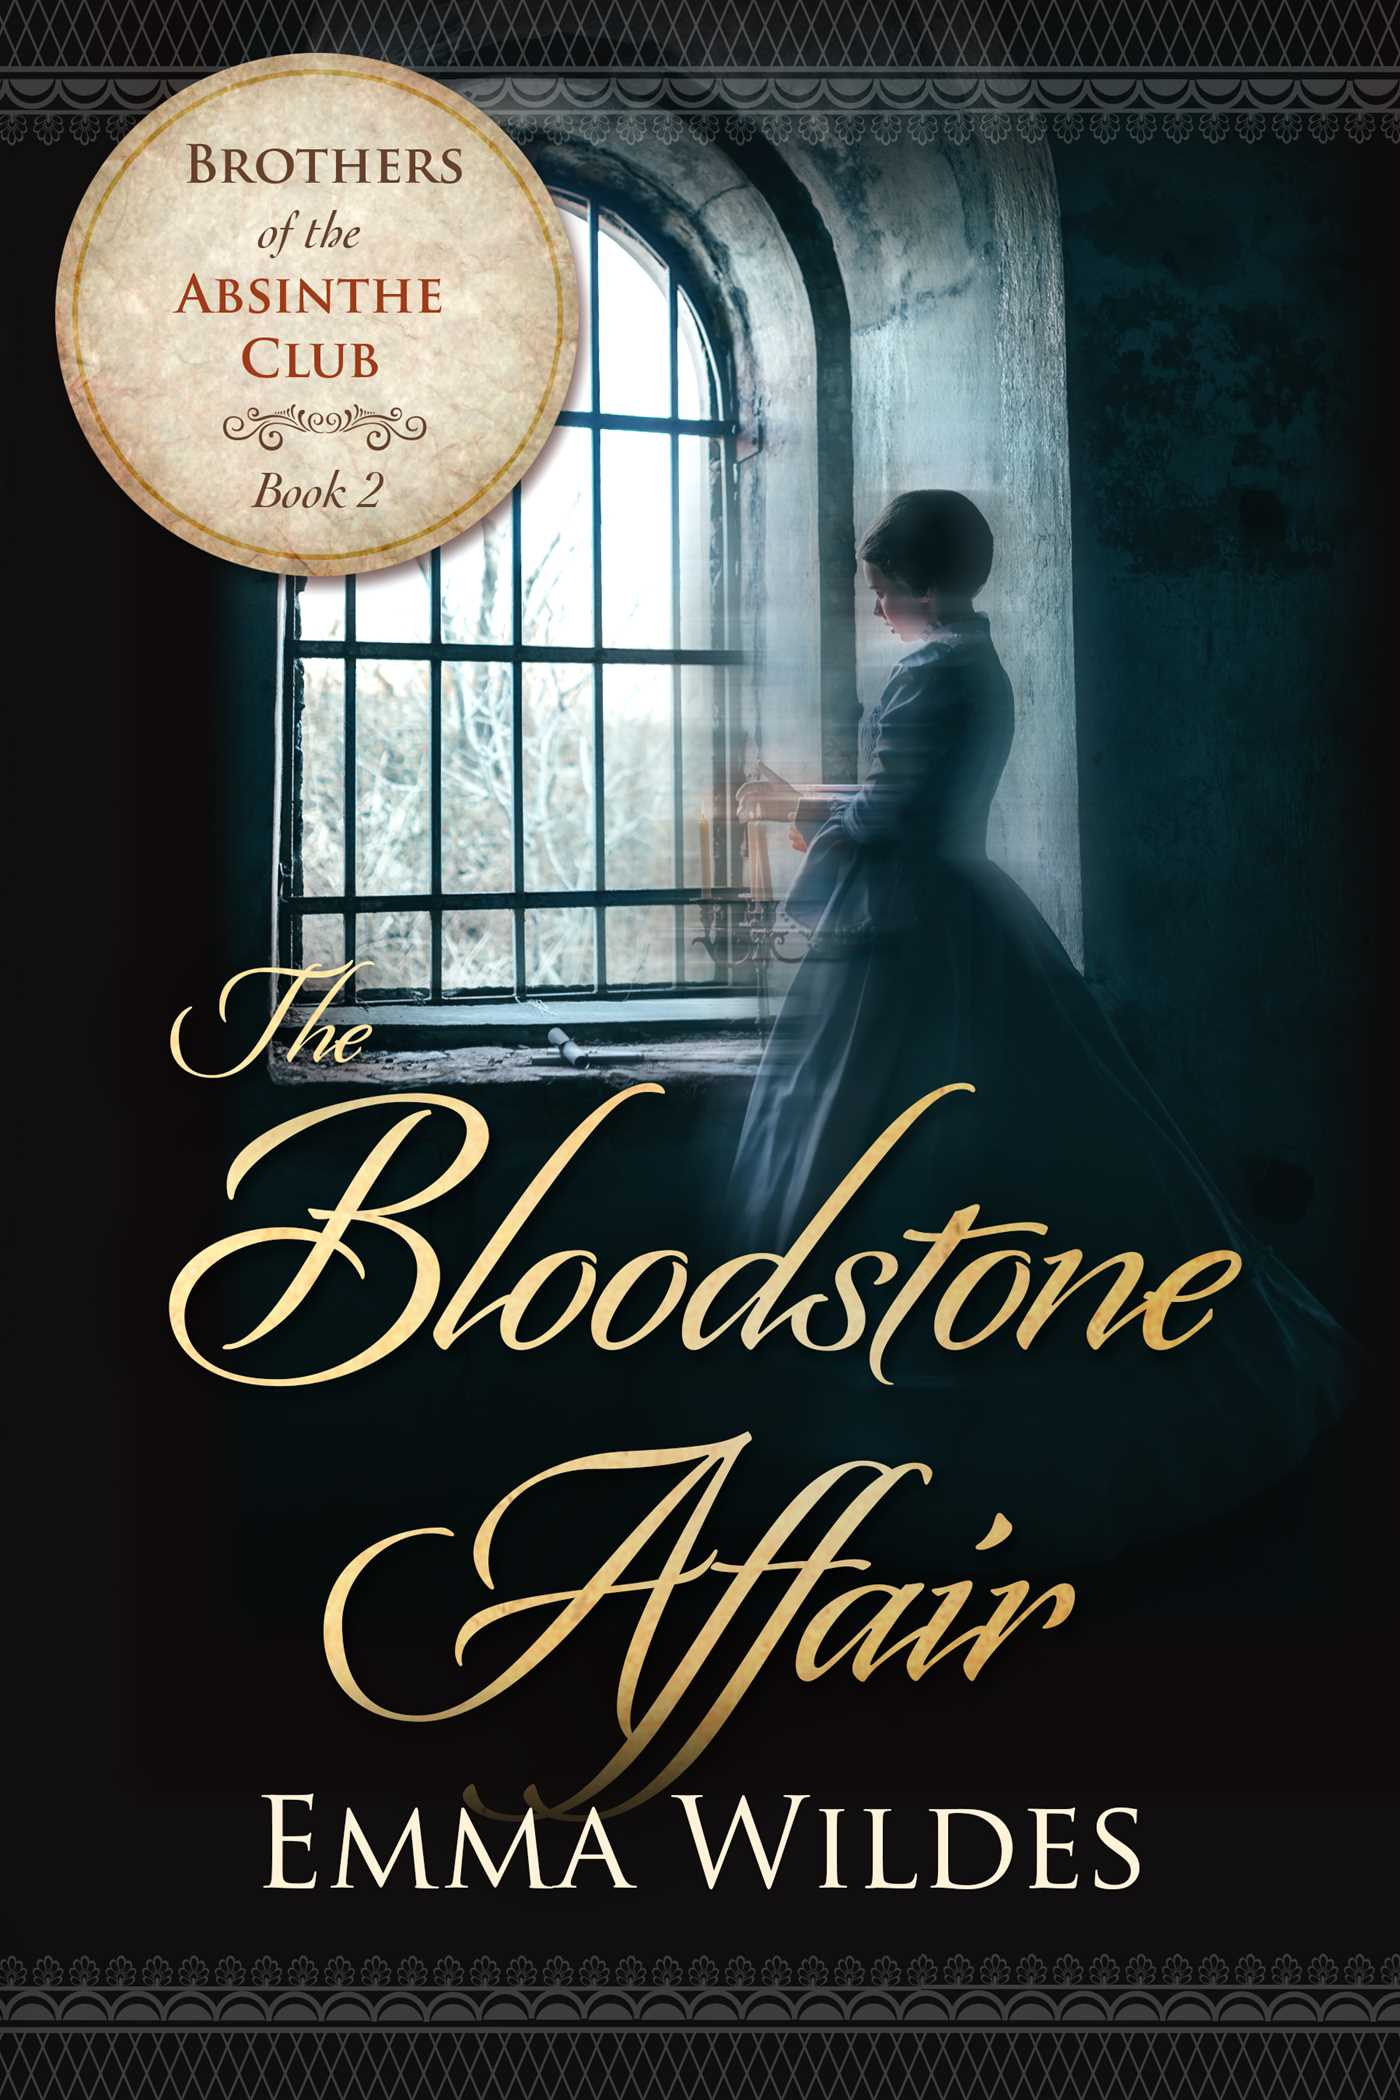 The bloodstone affair 9781682992562 hr